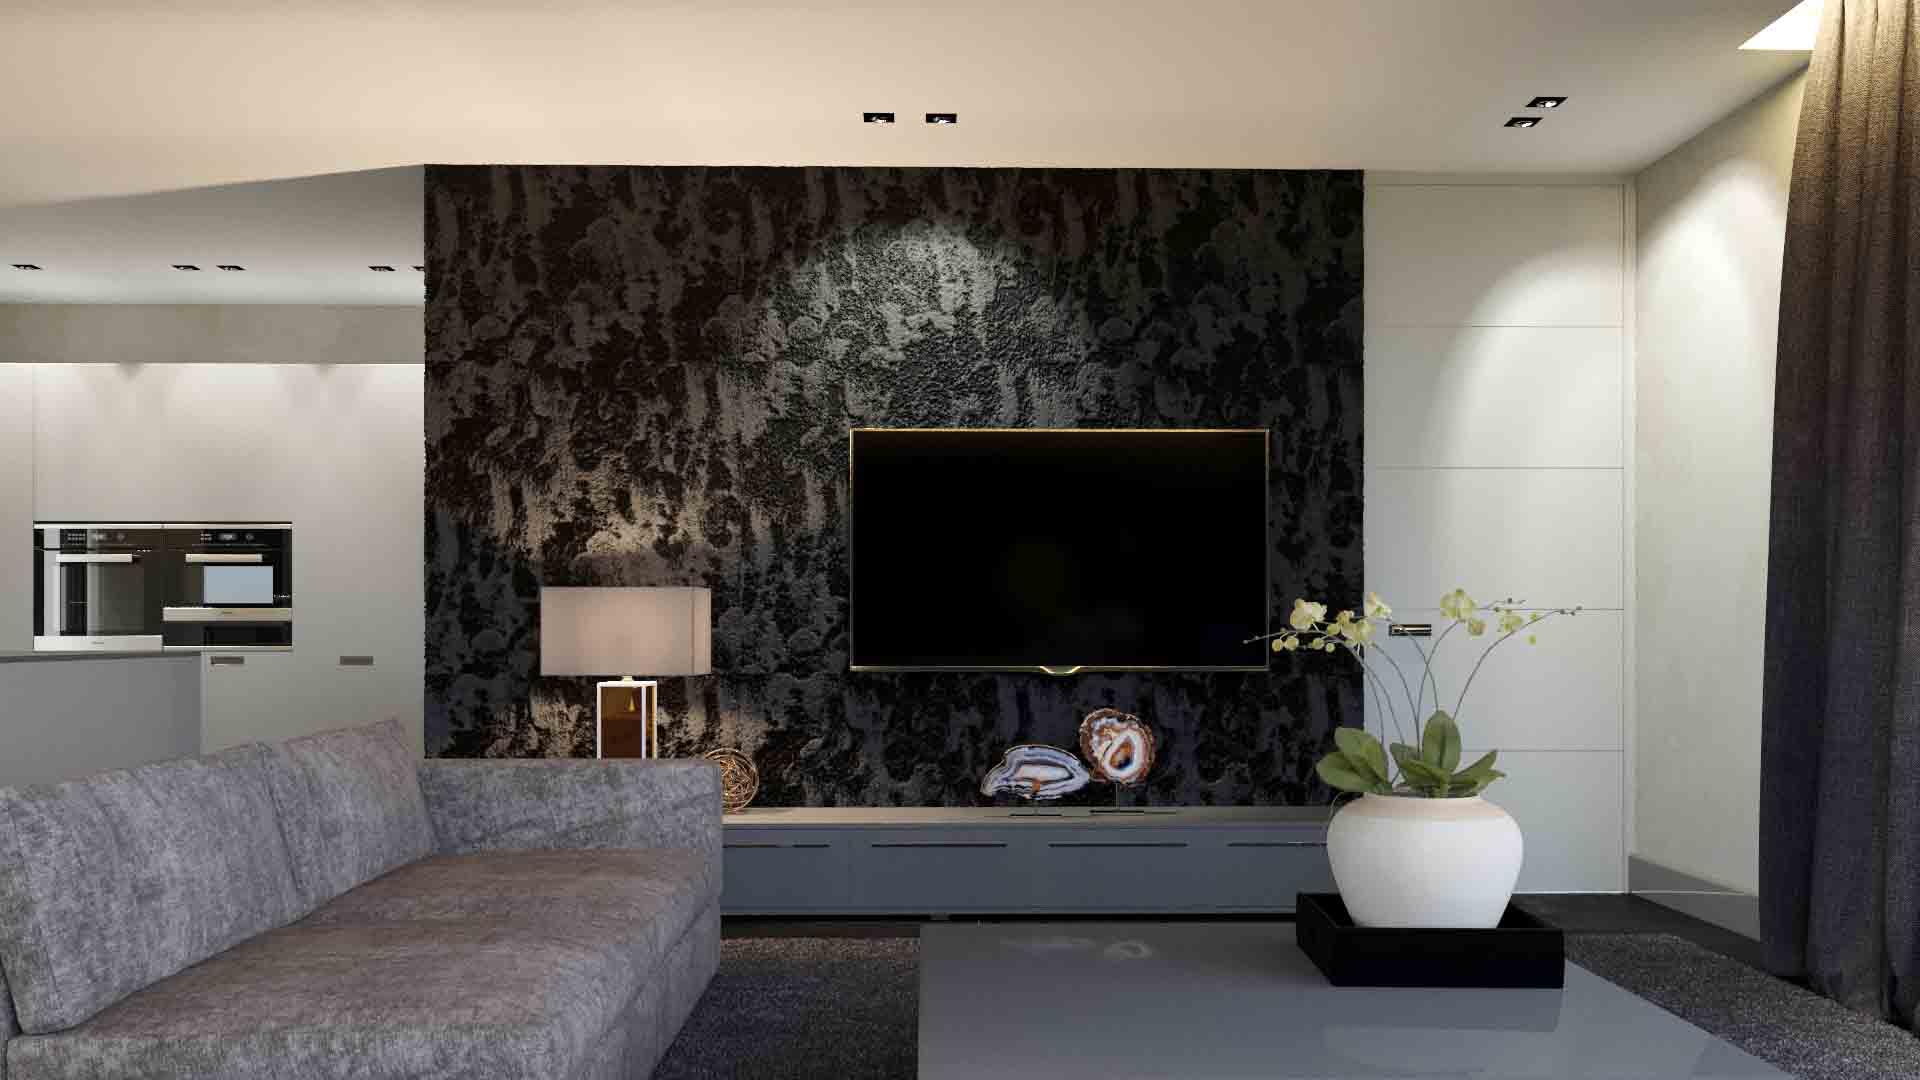 Penthouse-almere-duin-poort-nieuwbouw-duin-interior.03